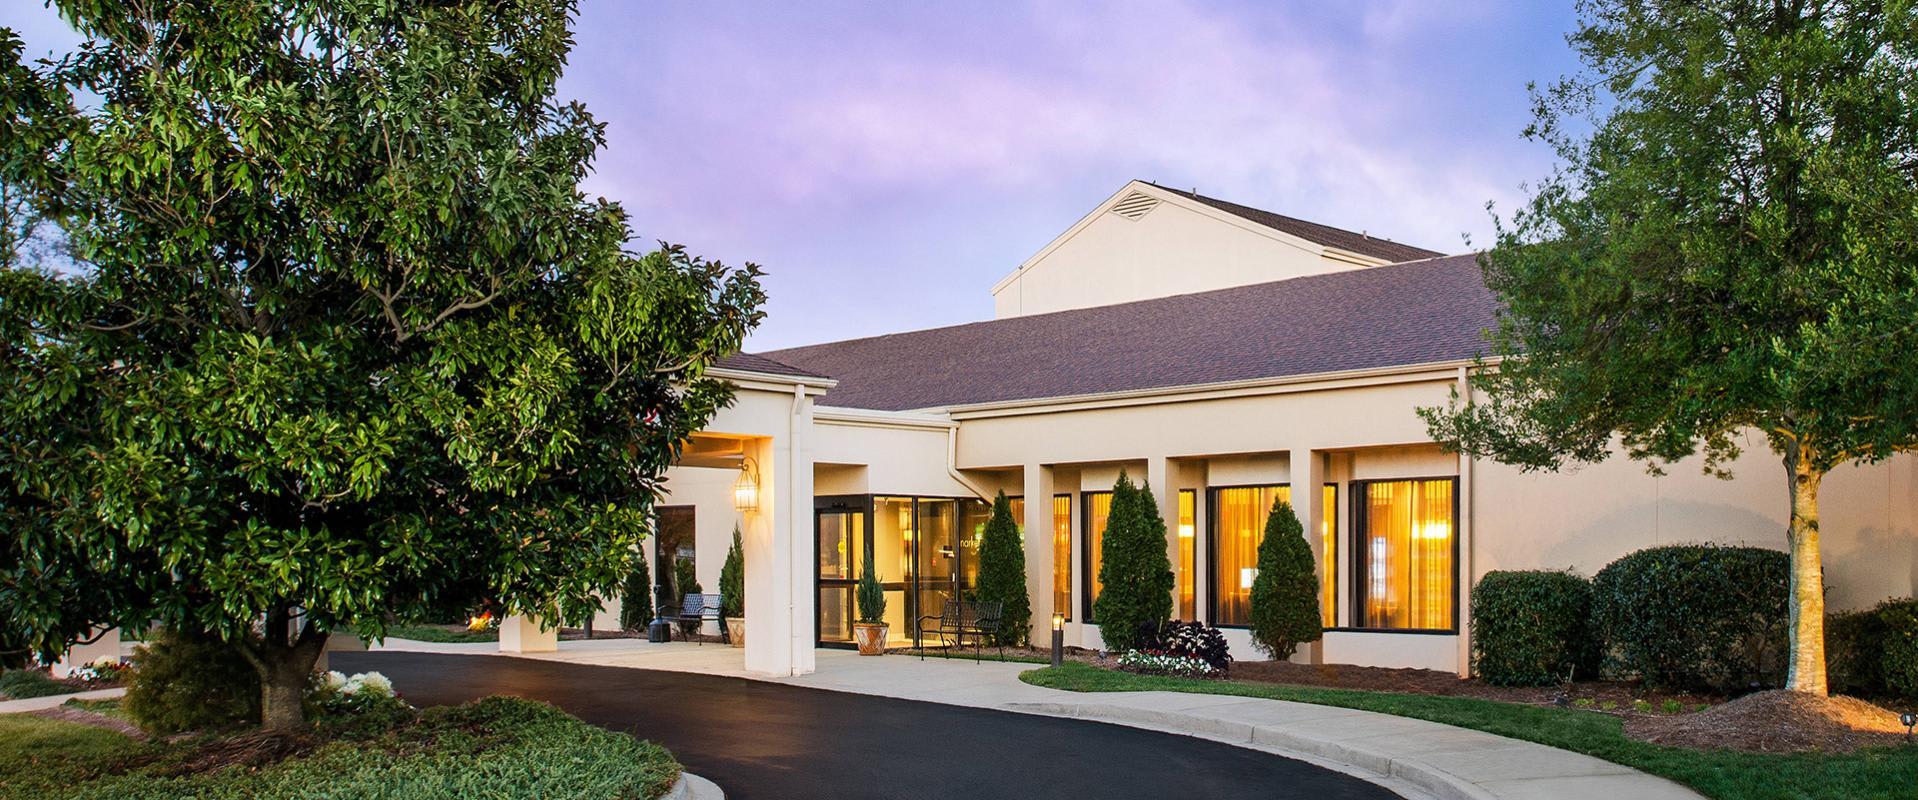 Sonesta Select Spartanburg Hotel